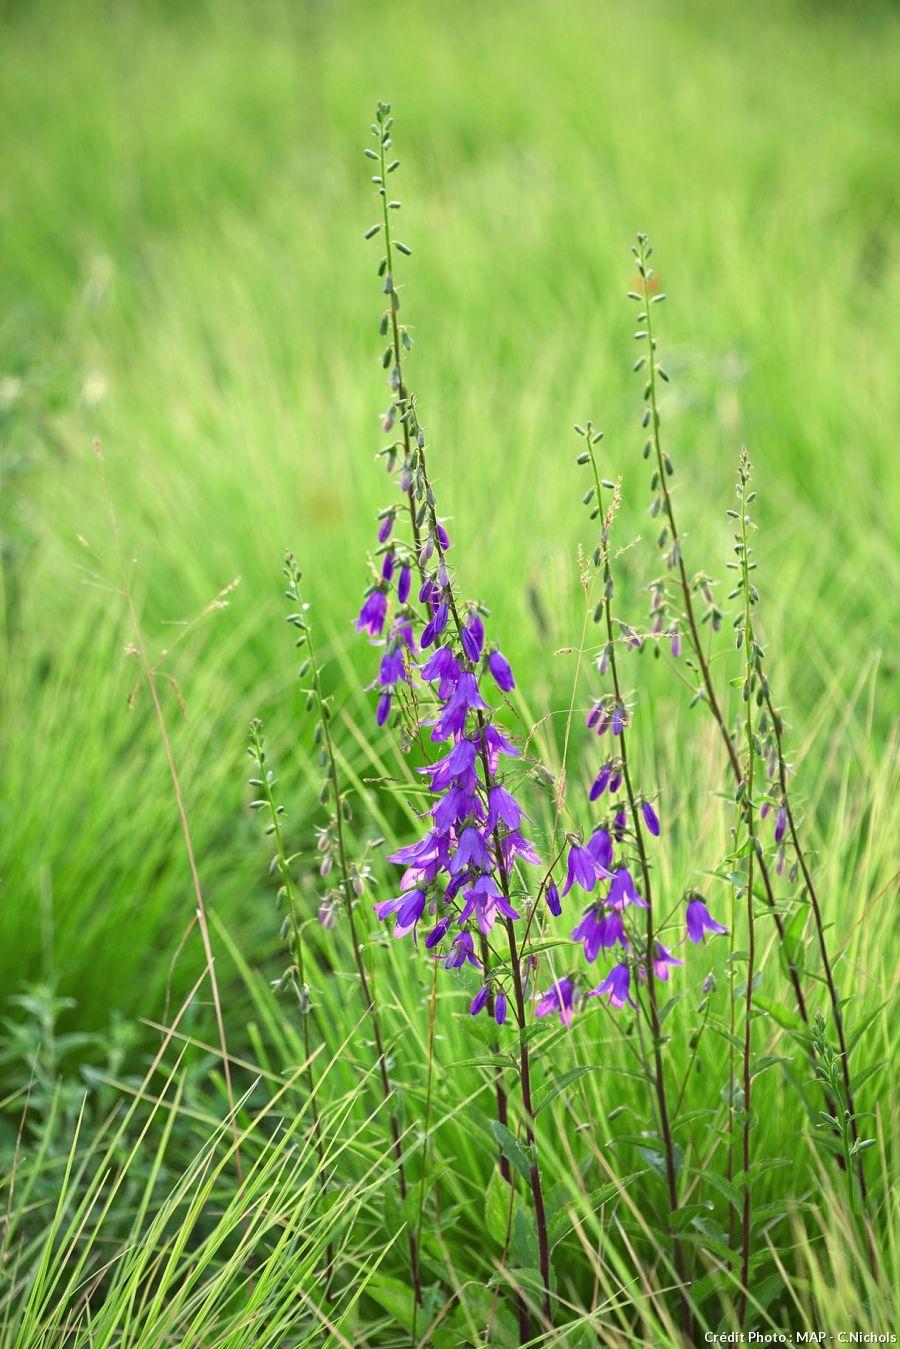 9 Plantes Sauvages A Cultiver Au Jardin Jardin Pinterest Garden